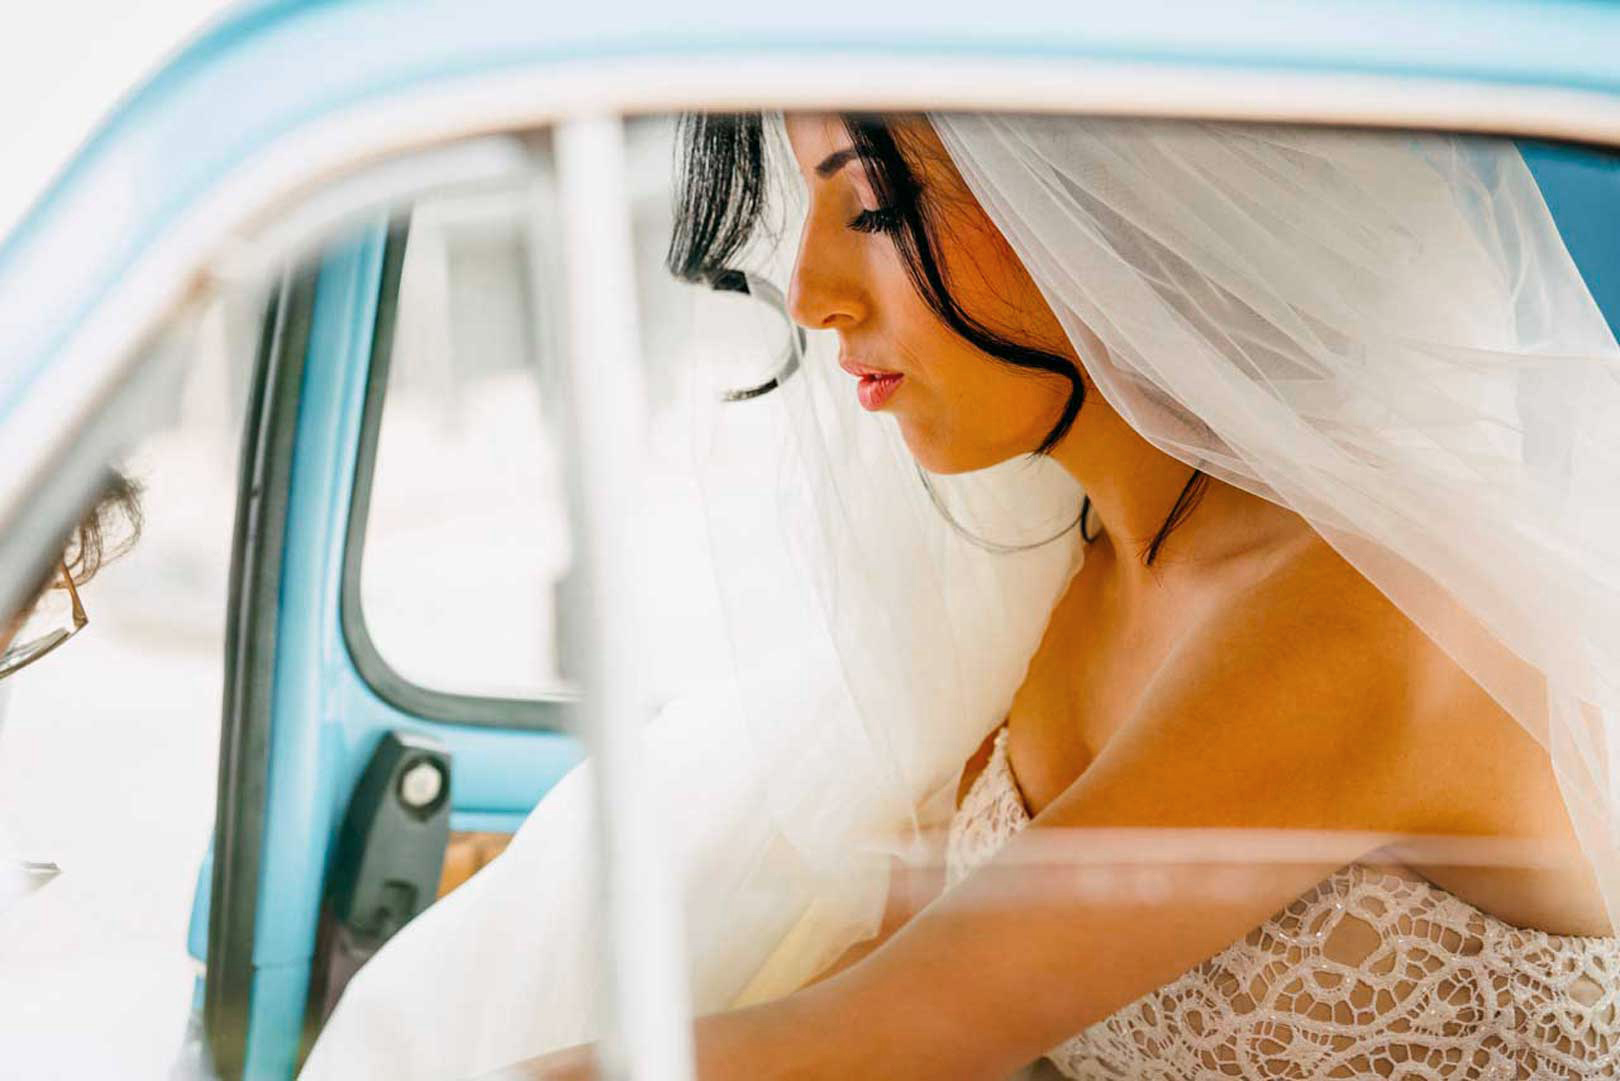 015-sposa-gianni-lepore-fotografo-foggia